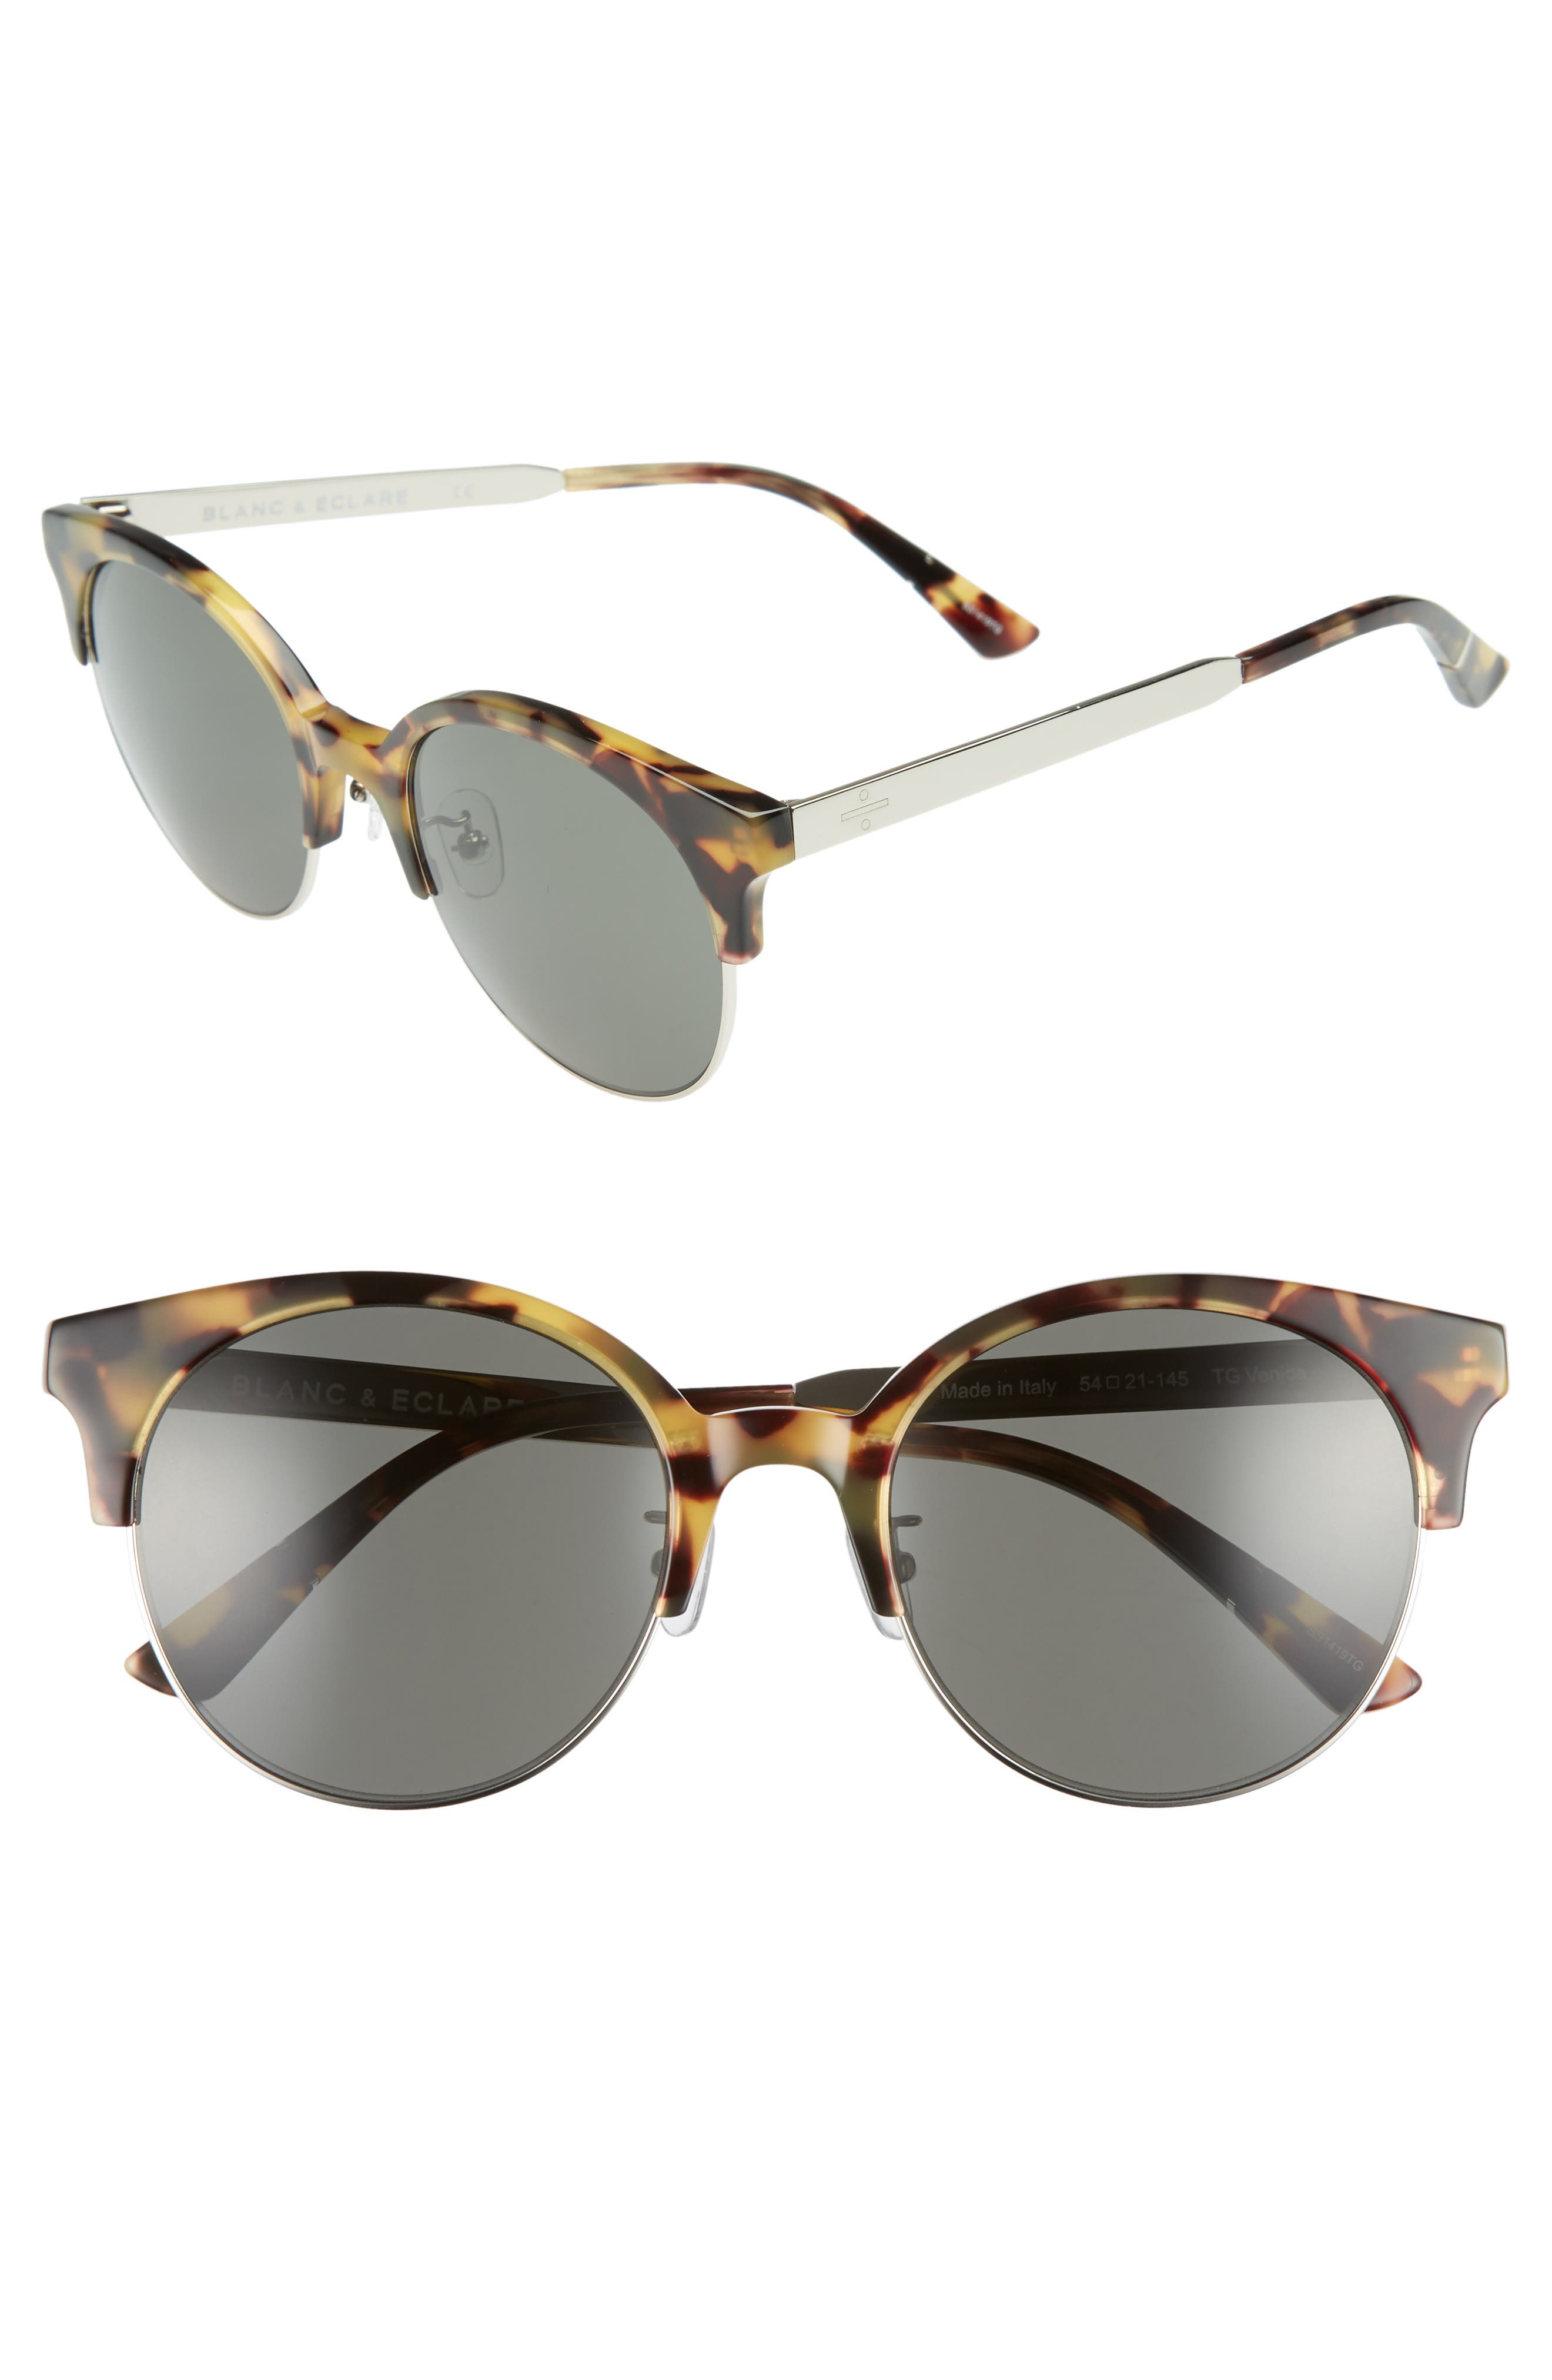 BLANC & ECLARE Venice Round Sunglasses,                             Main thumbnail 1, color,                             Tortoise/ Grey